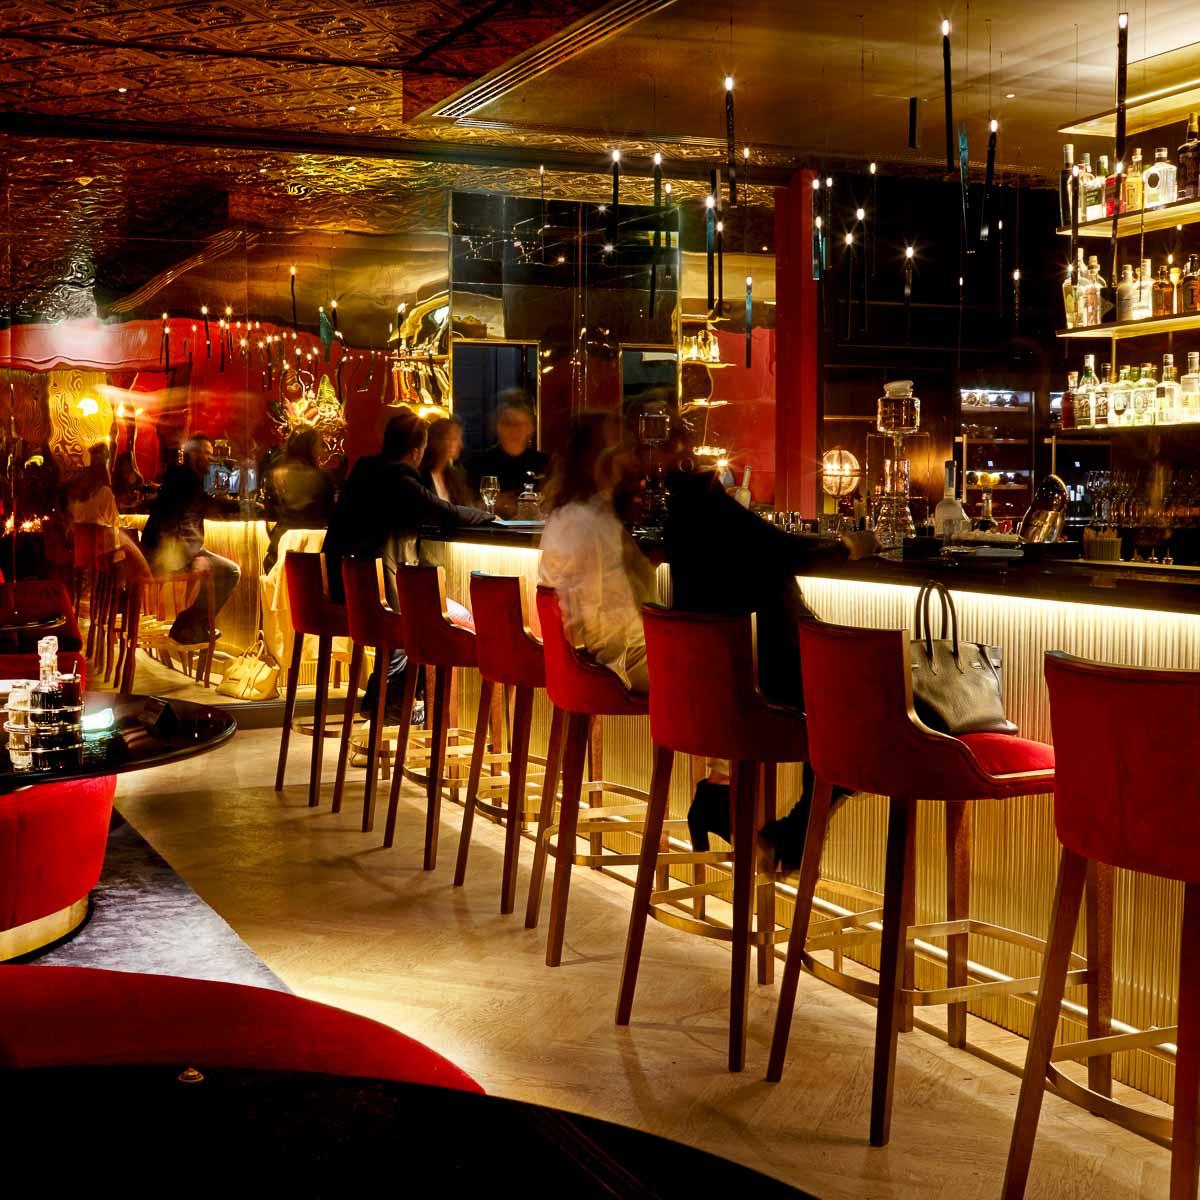 Hotel Bar Provocateur Berlin Wilmersdorf Chrlottenburg-2